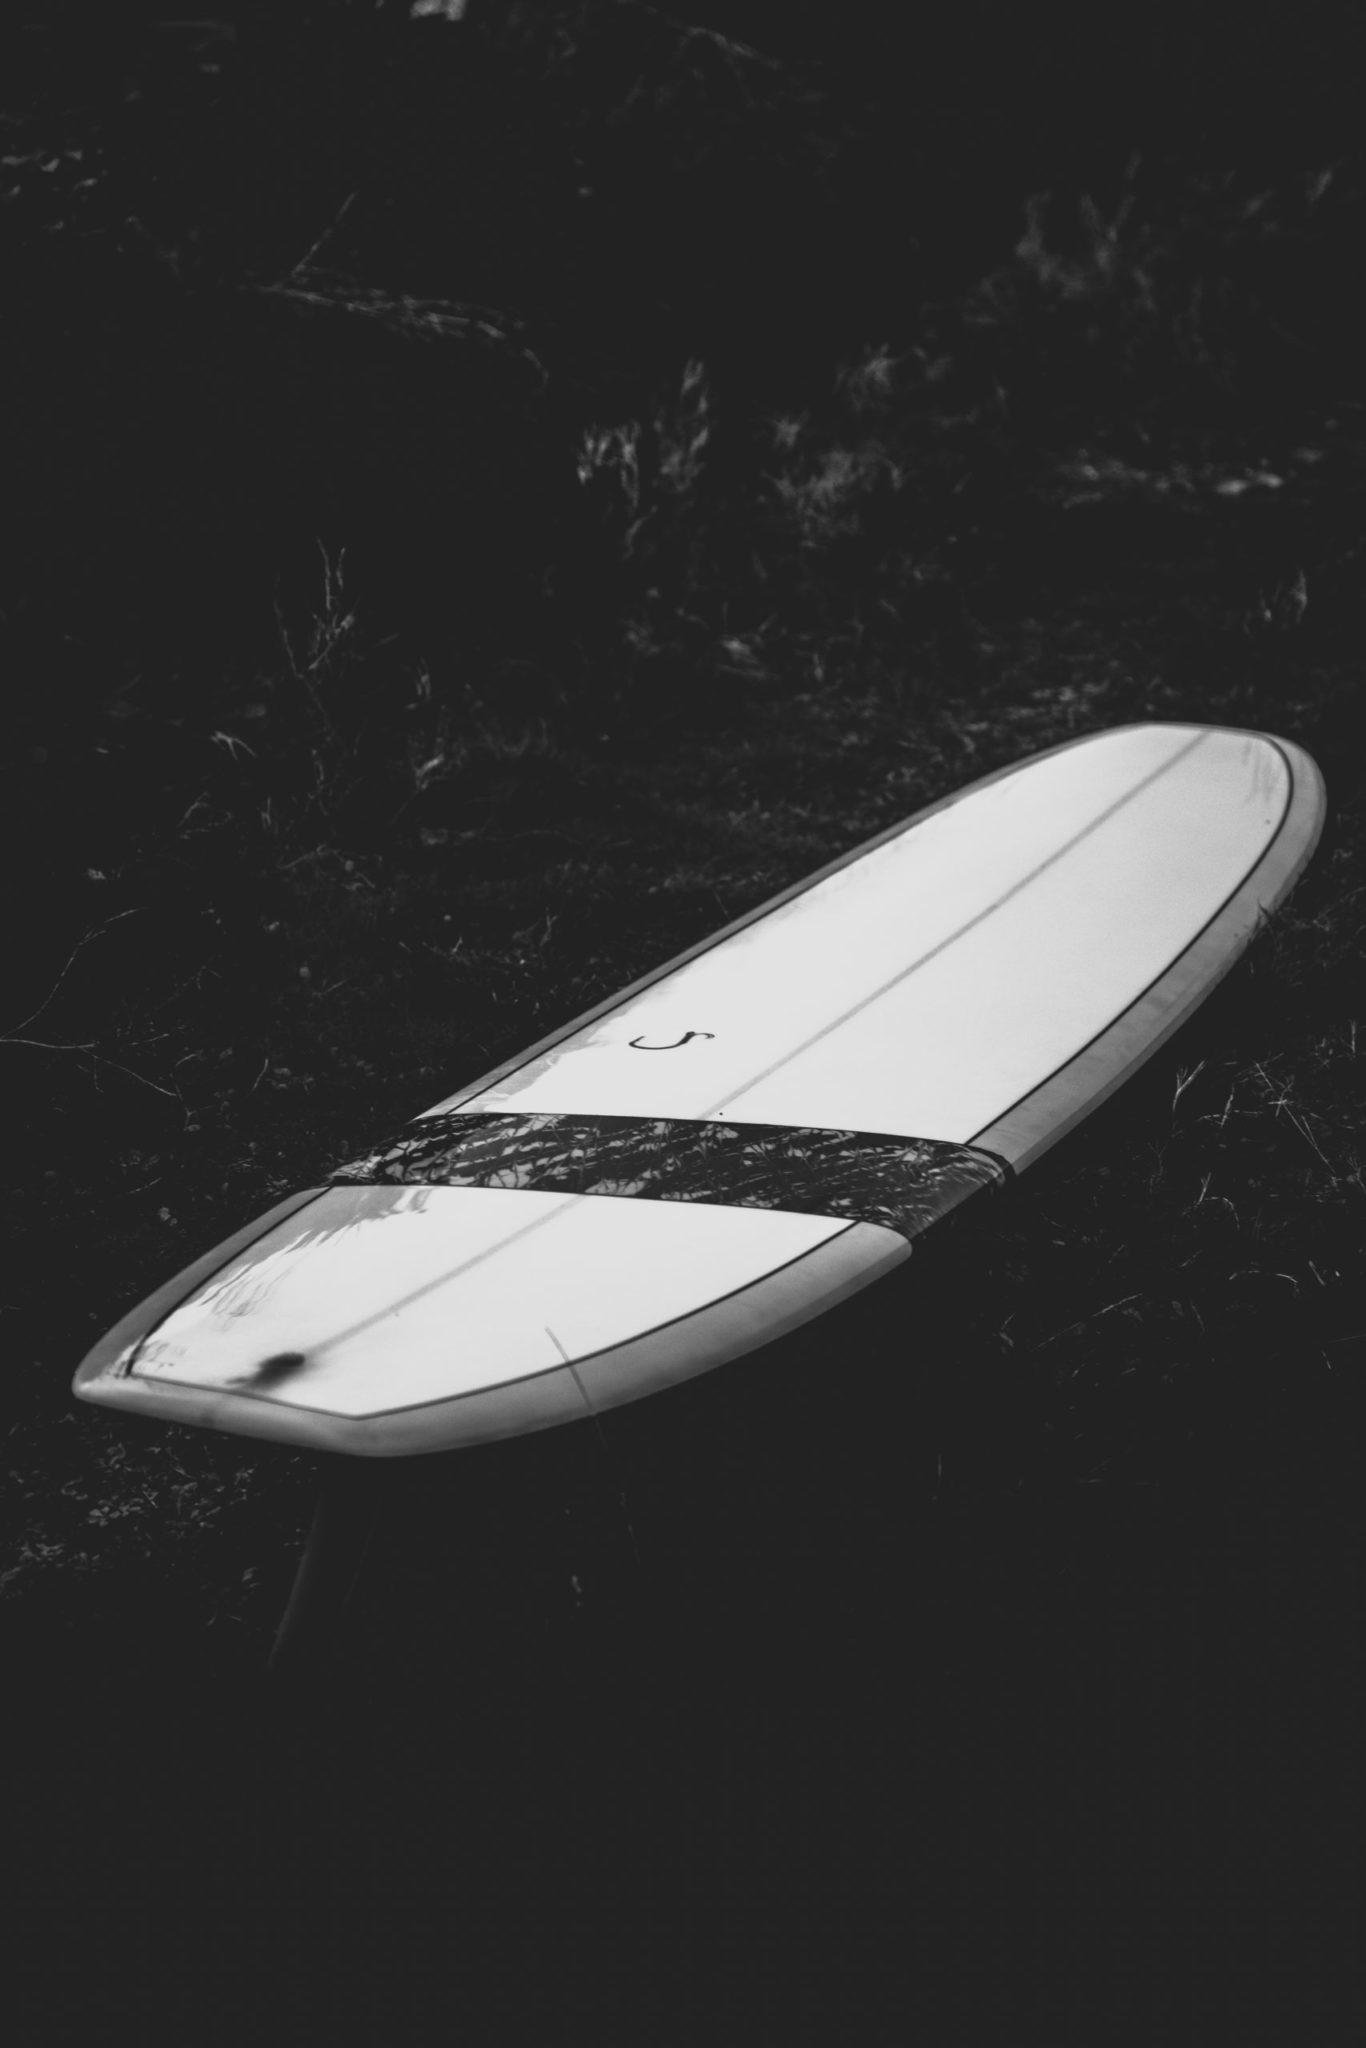 Cachalot Surfboards planche surfboard artisan surf shaper bois hollow wooden eps longboard